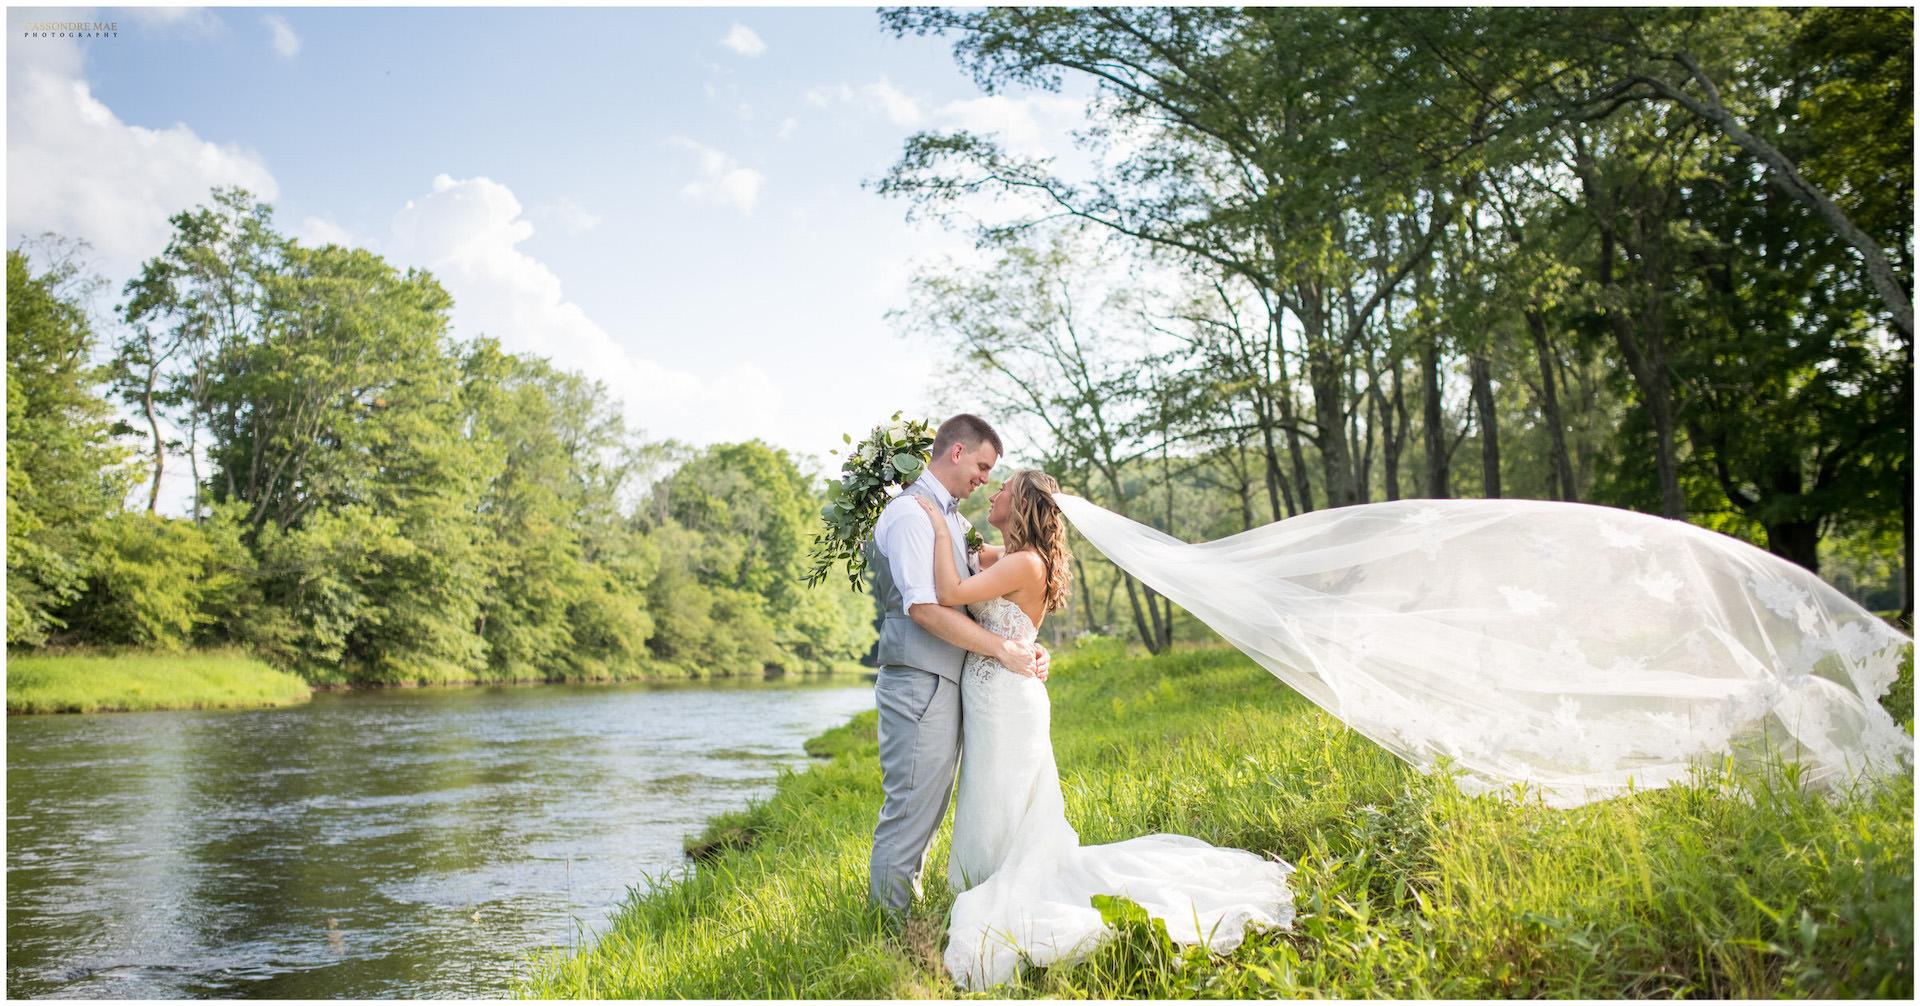 Cassondre Mae Photography Hudson Valley Wedding 25.jpg